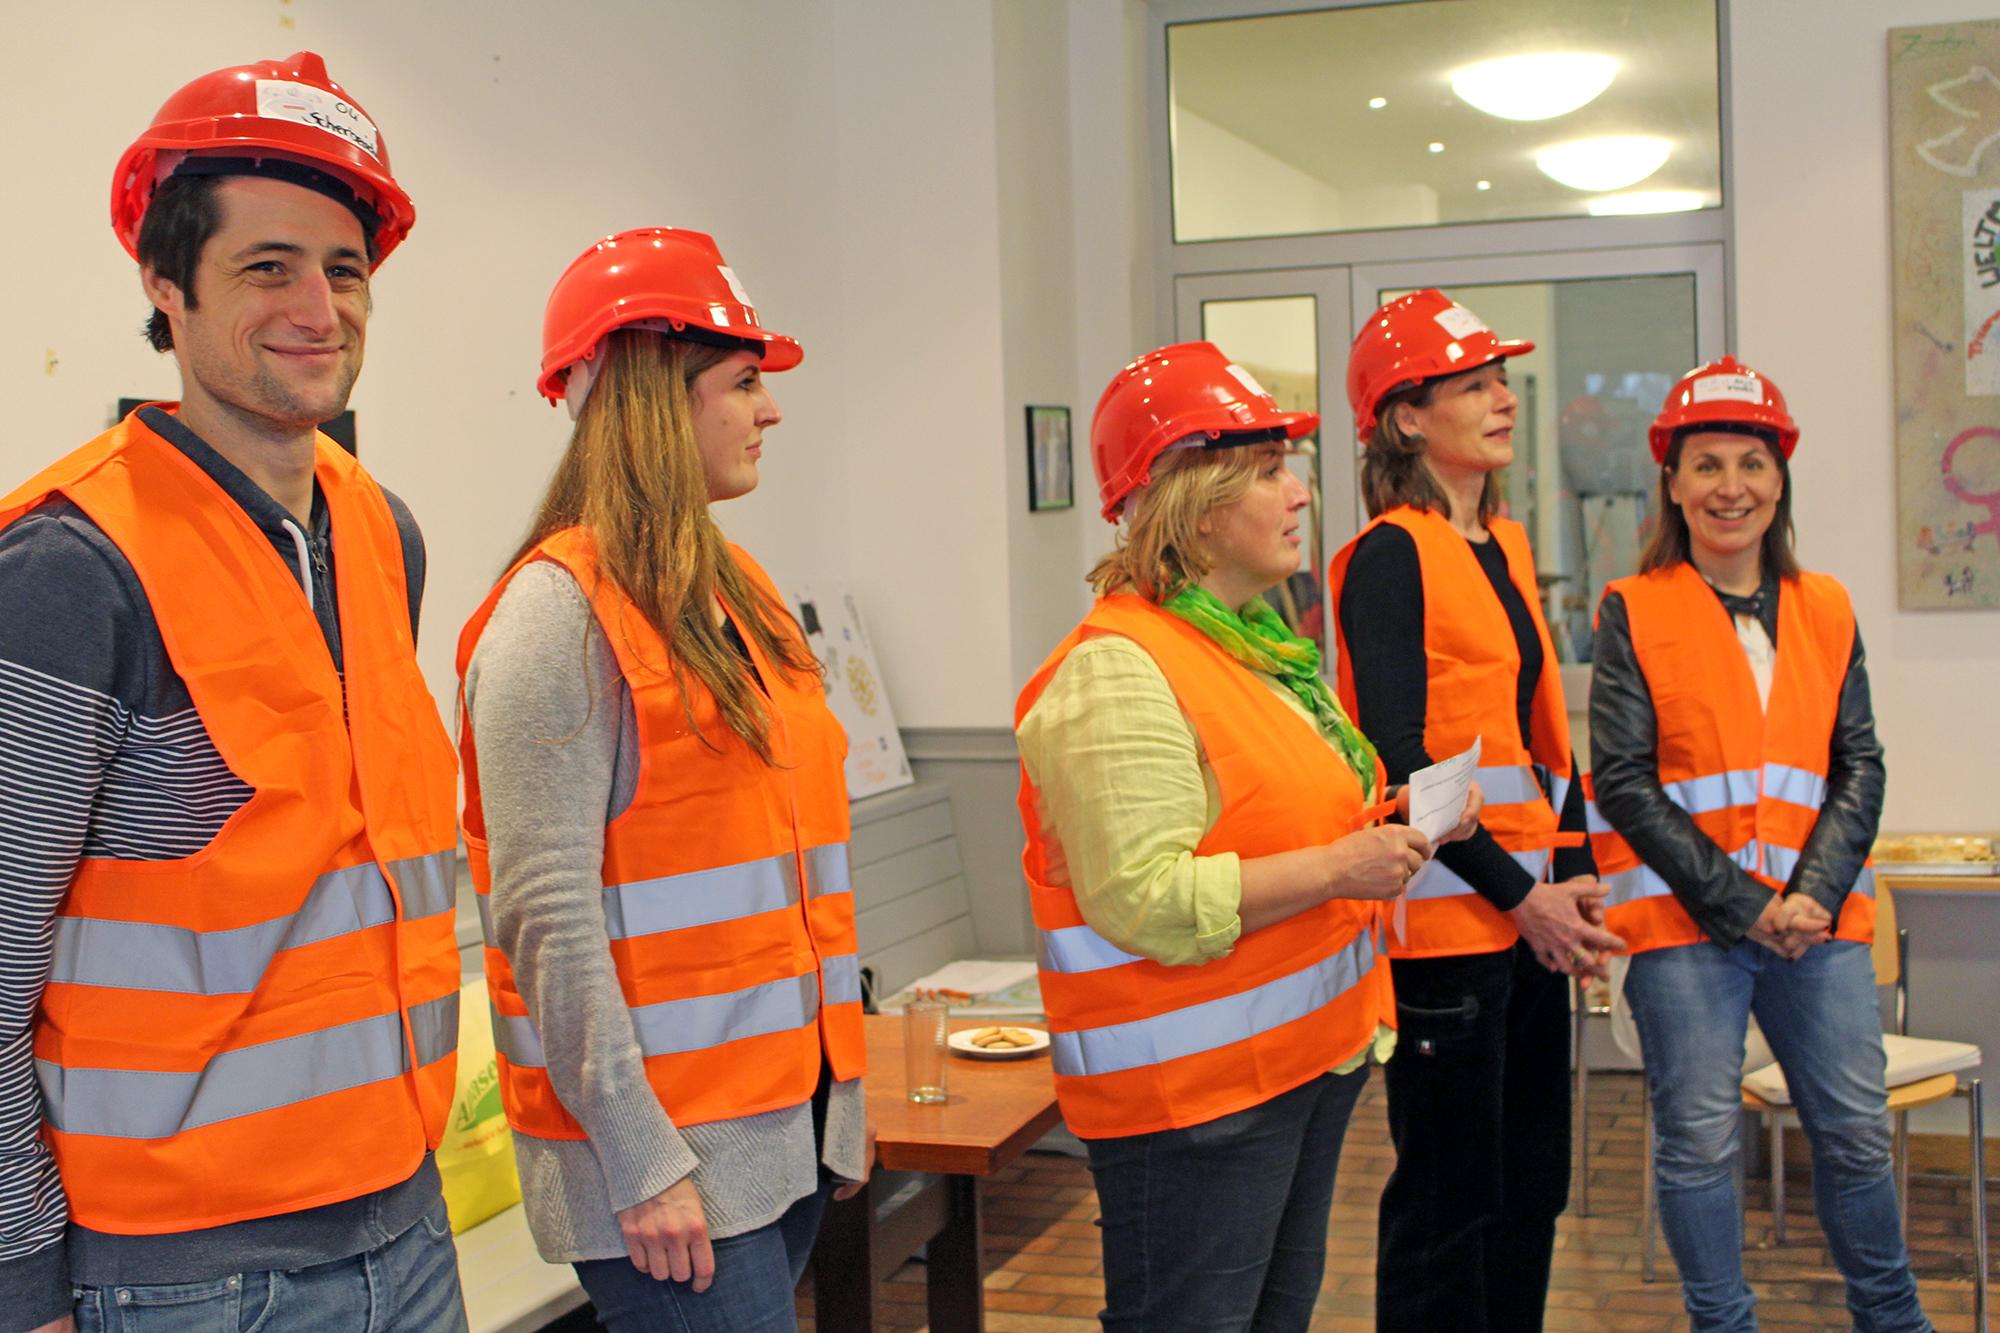 Das Team: Oliver Scherberich, Tina Haut, Brunni Beth, Ursula Beck, Anja Florack